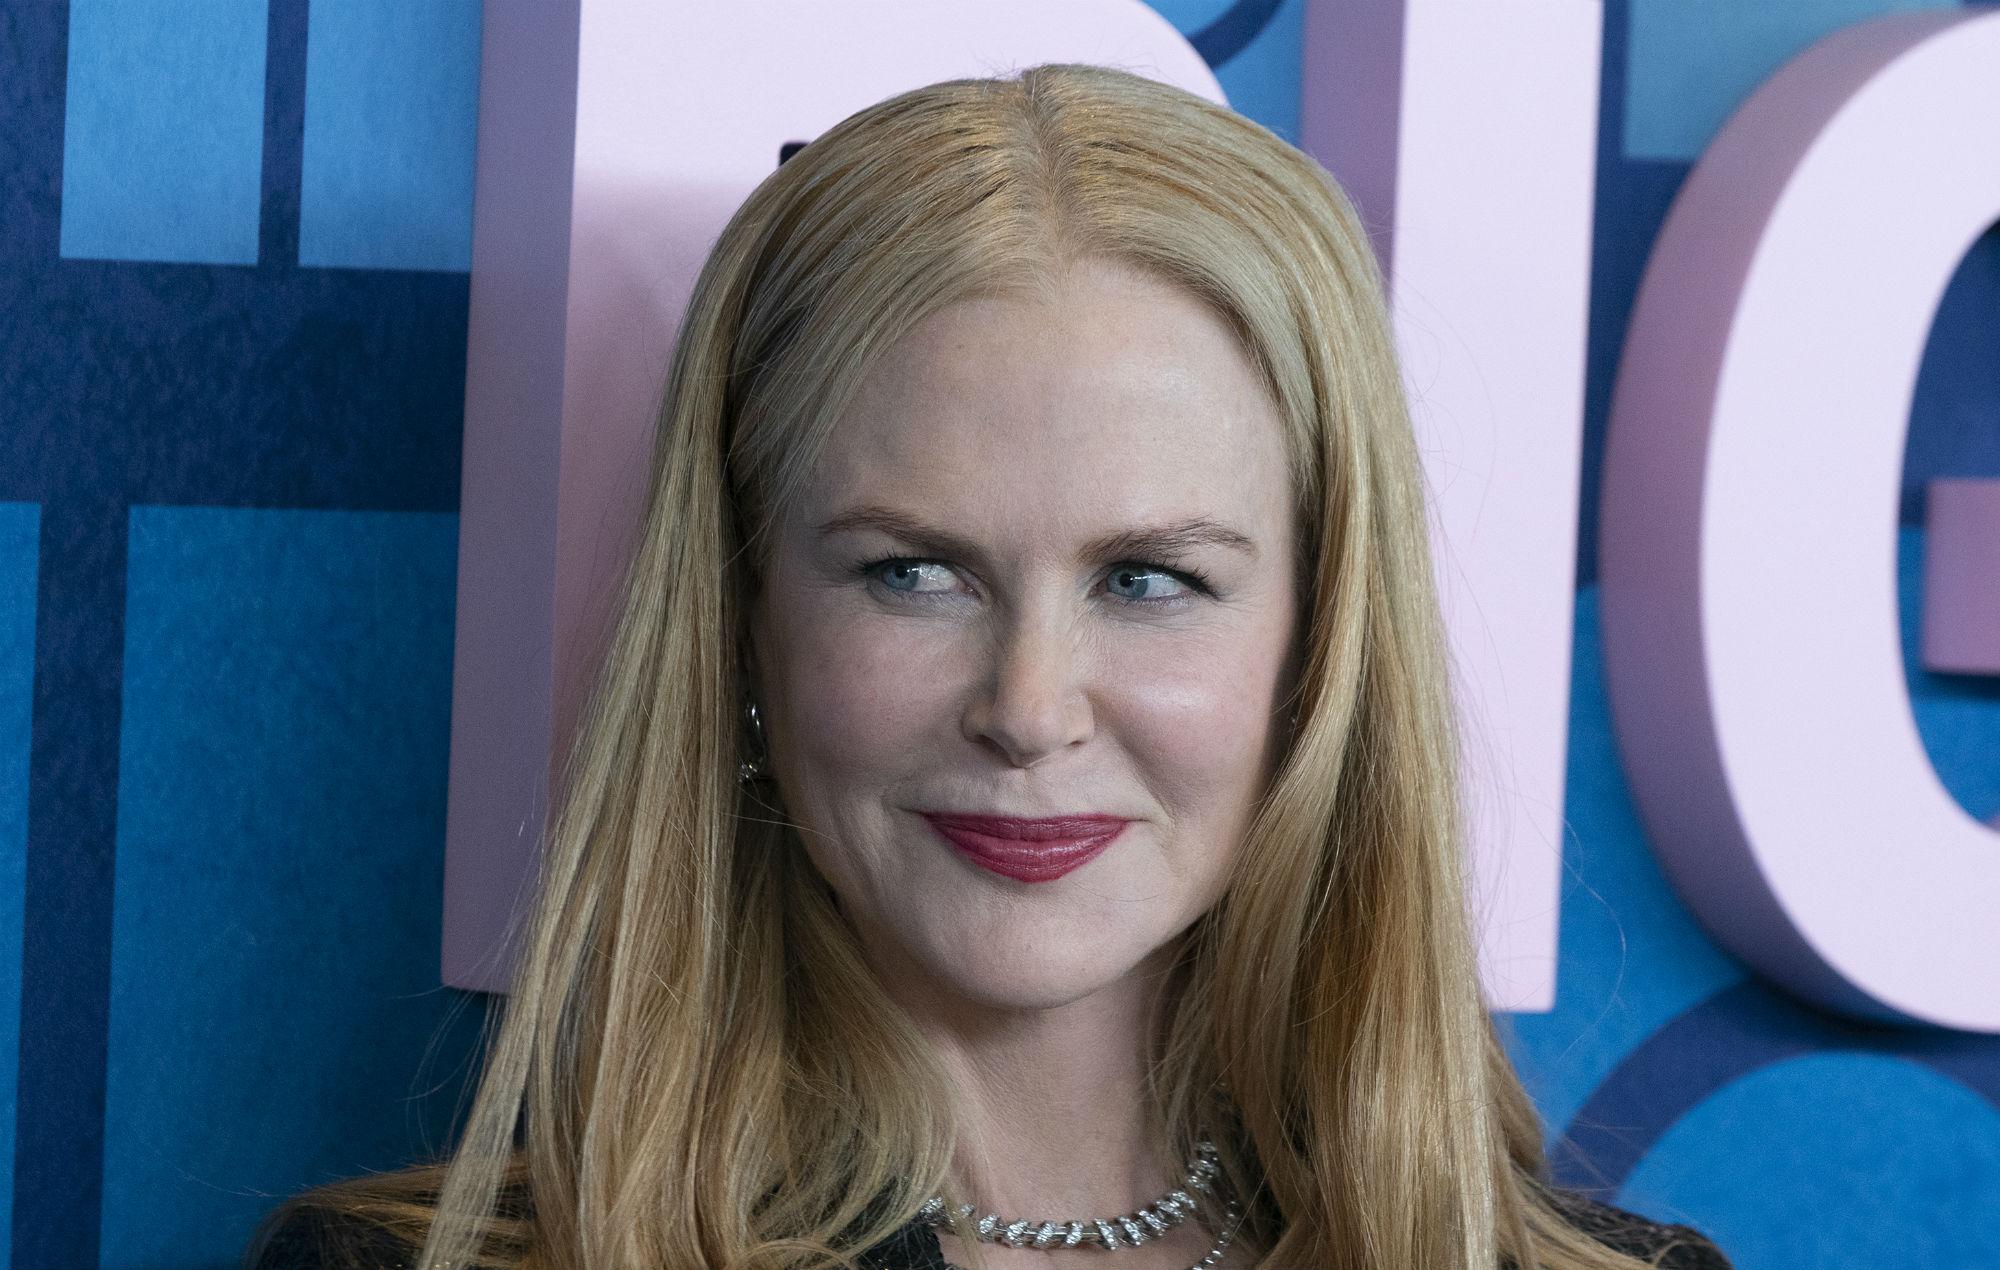 Nicole Kidman Big Little Lies season 2 premiere spoiler HBO